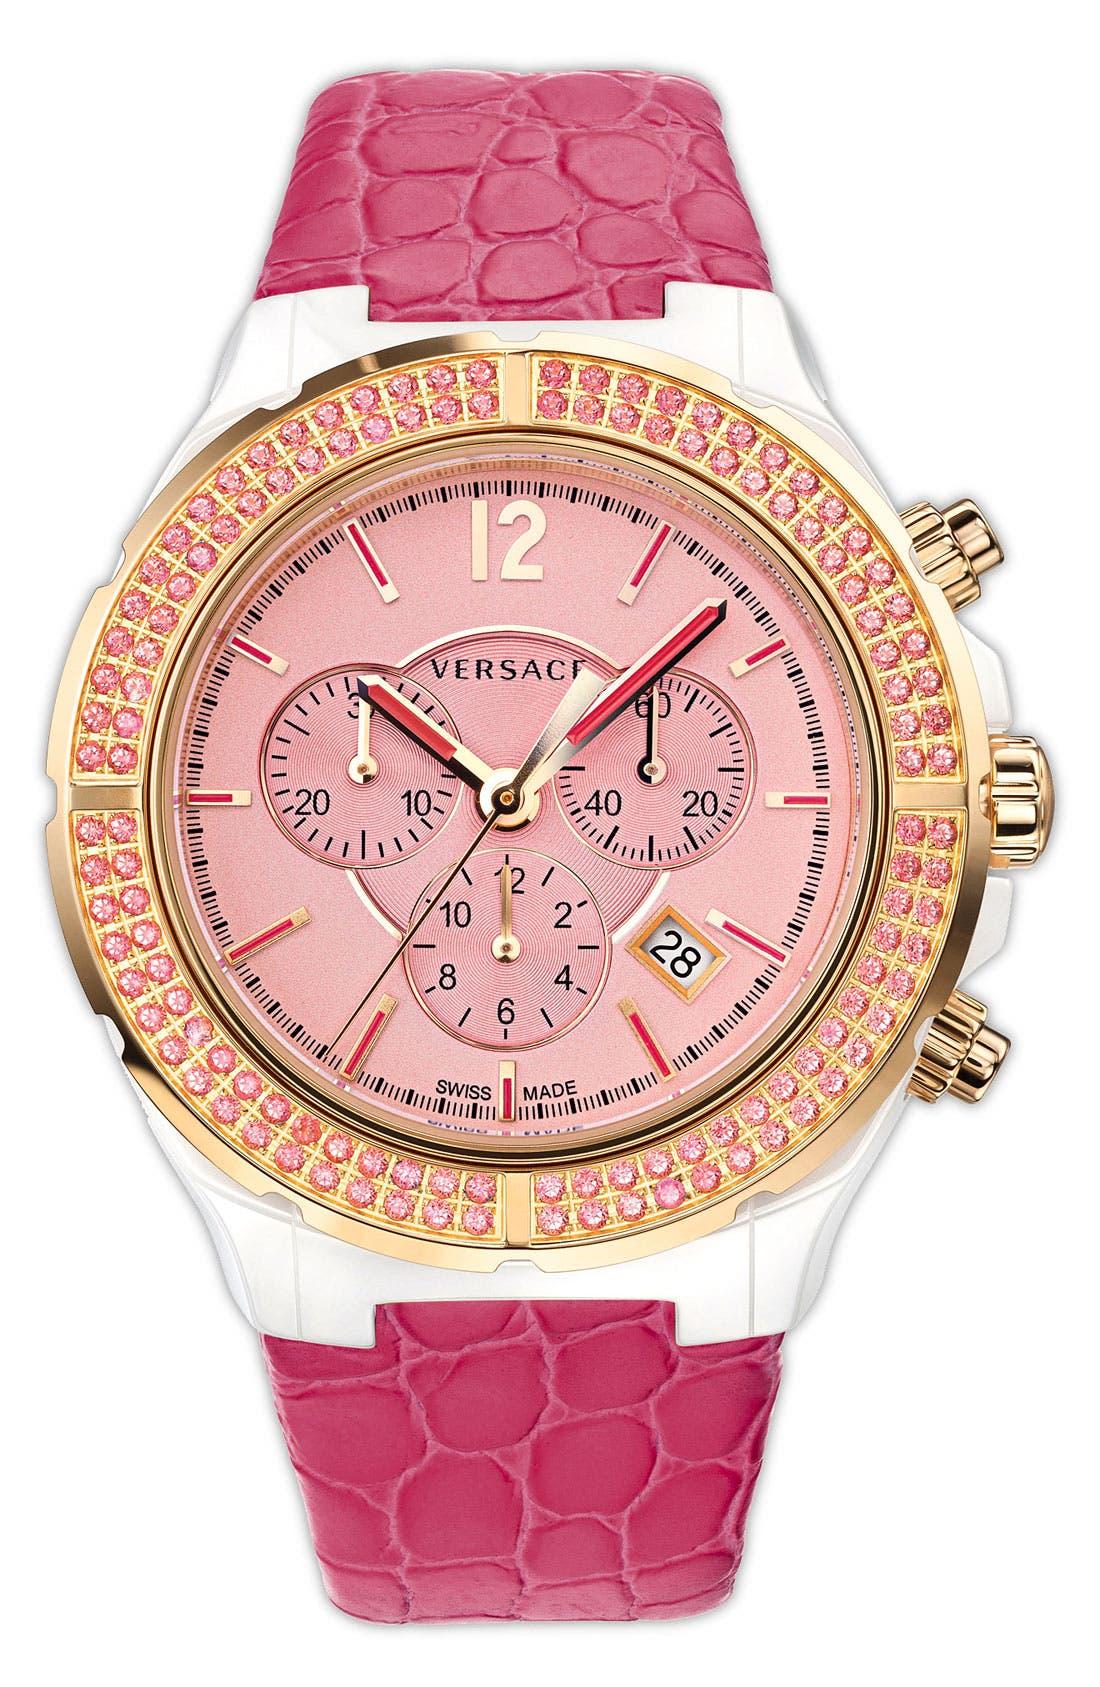 Main Image - Versace 'DV One Cruise' Topaz Bezel Watch, 43mm